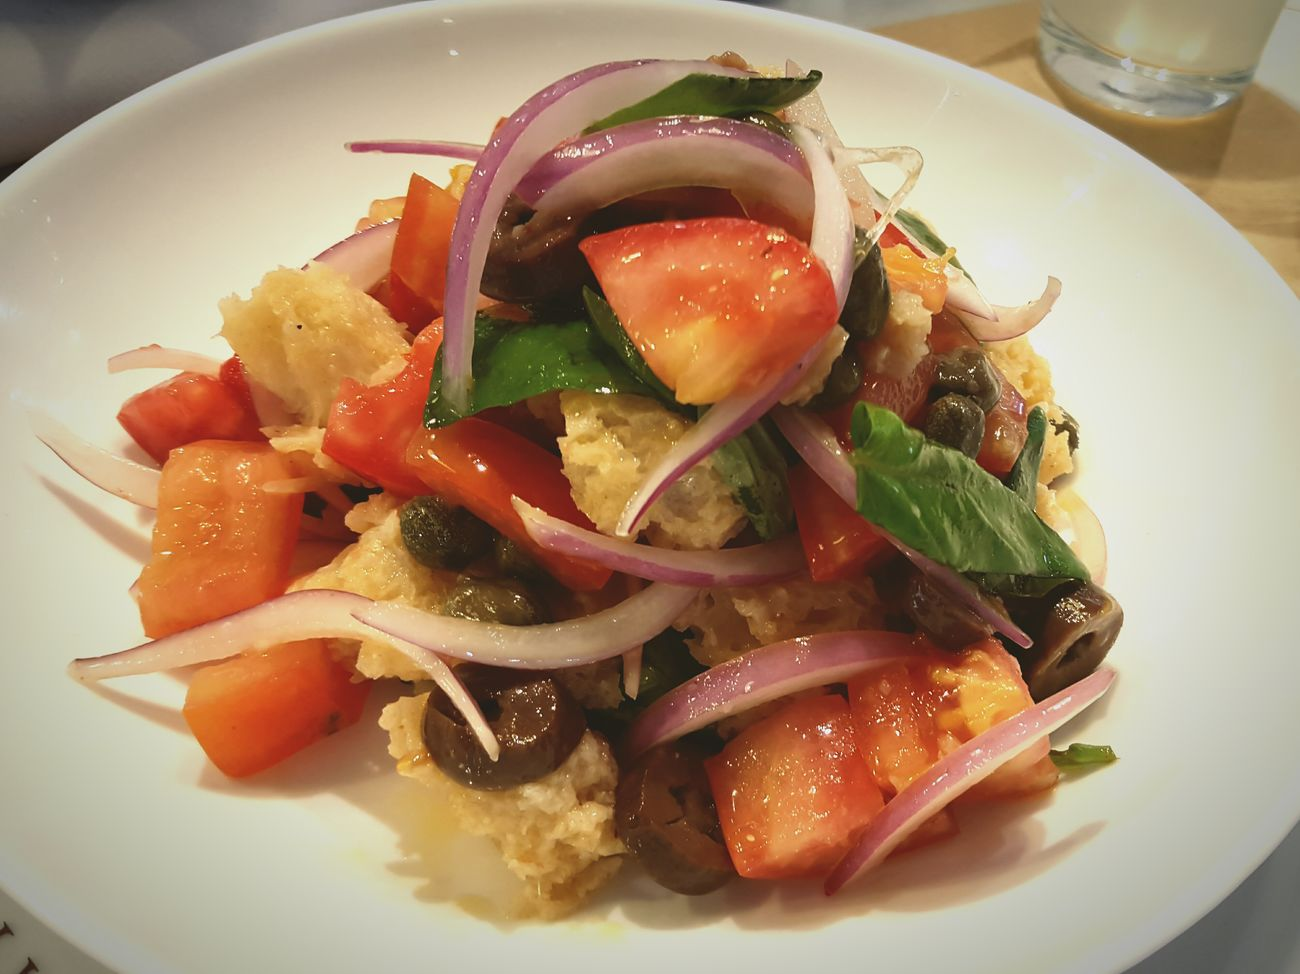 Food Salad Time Panzanella Eatalybr